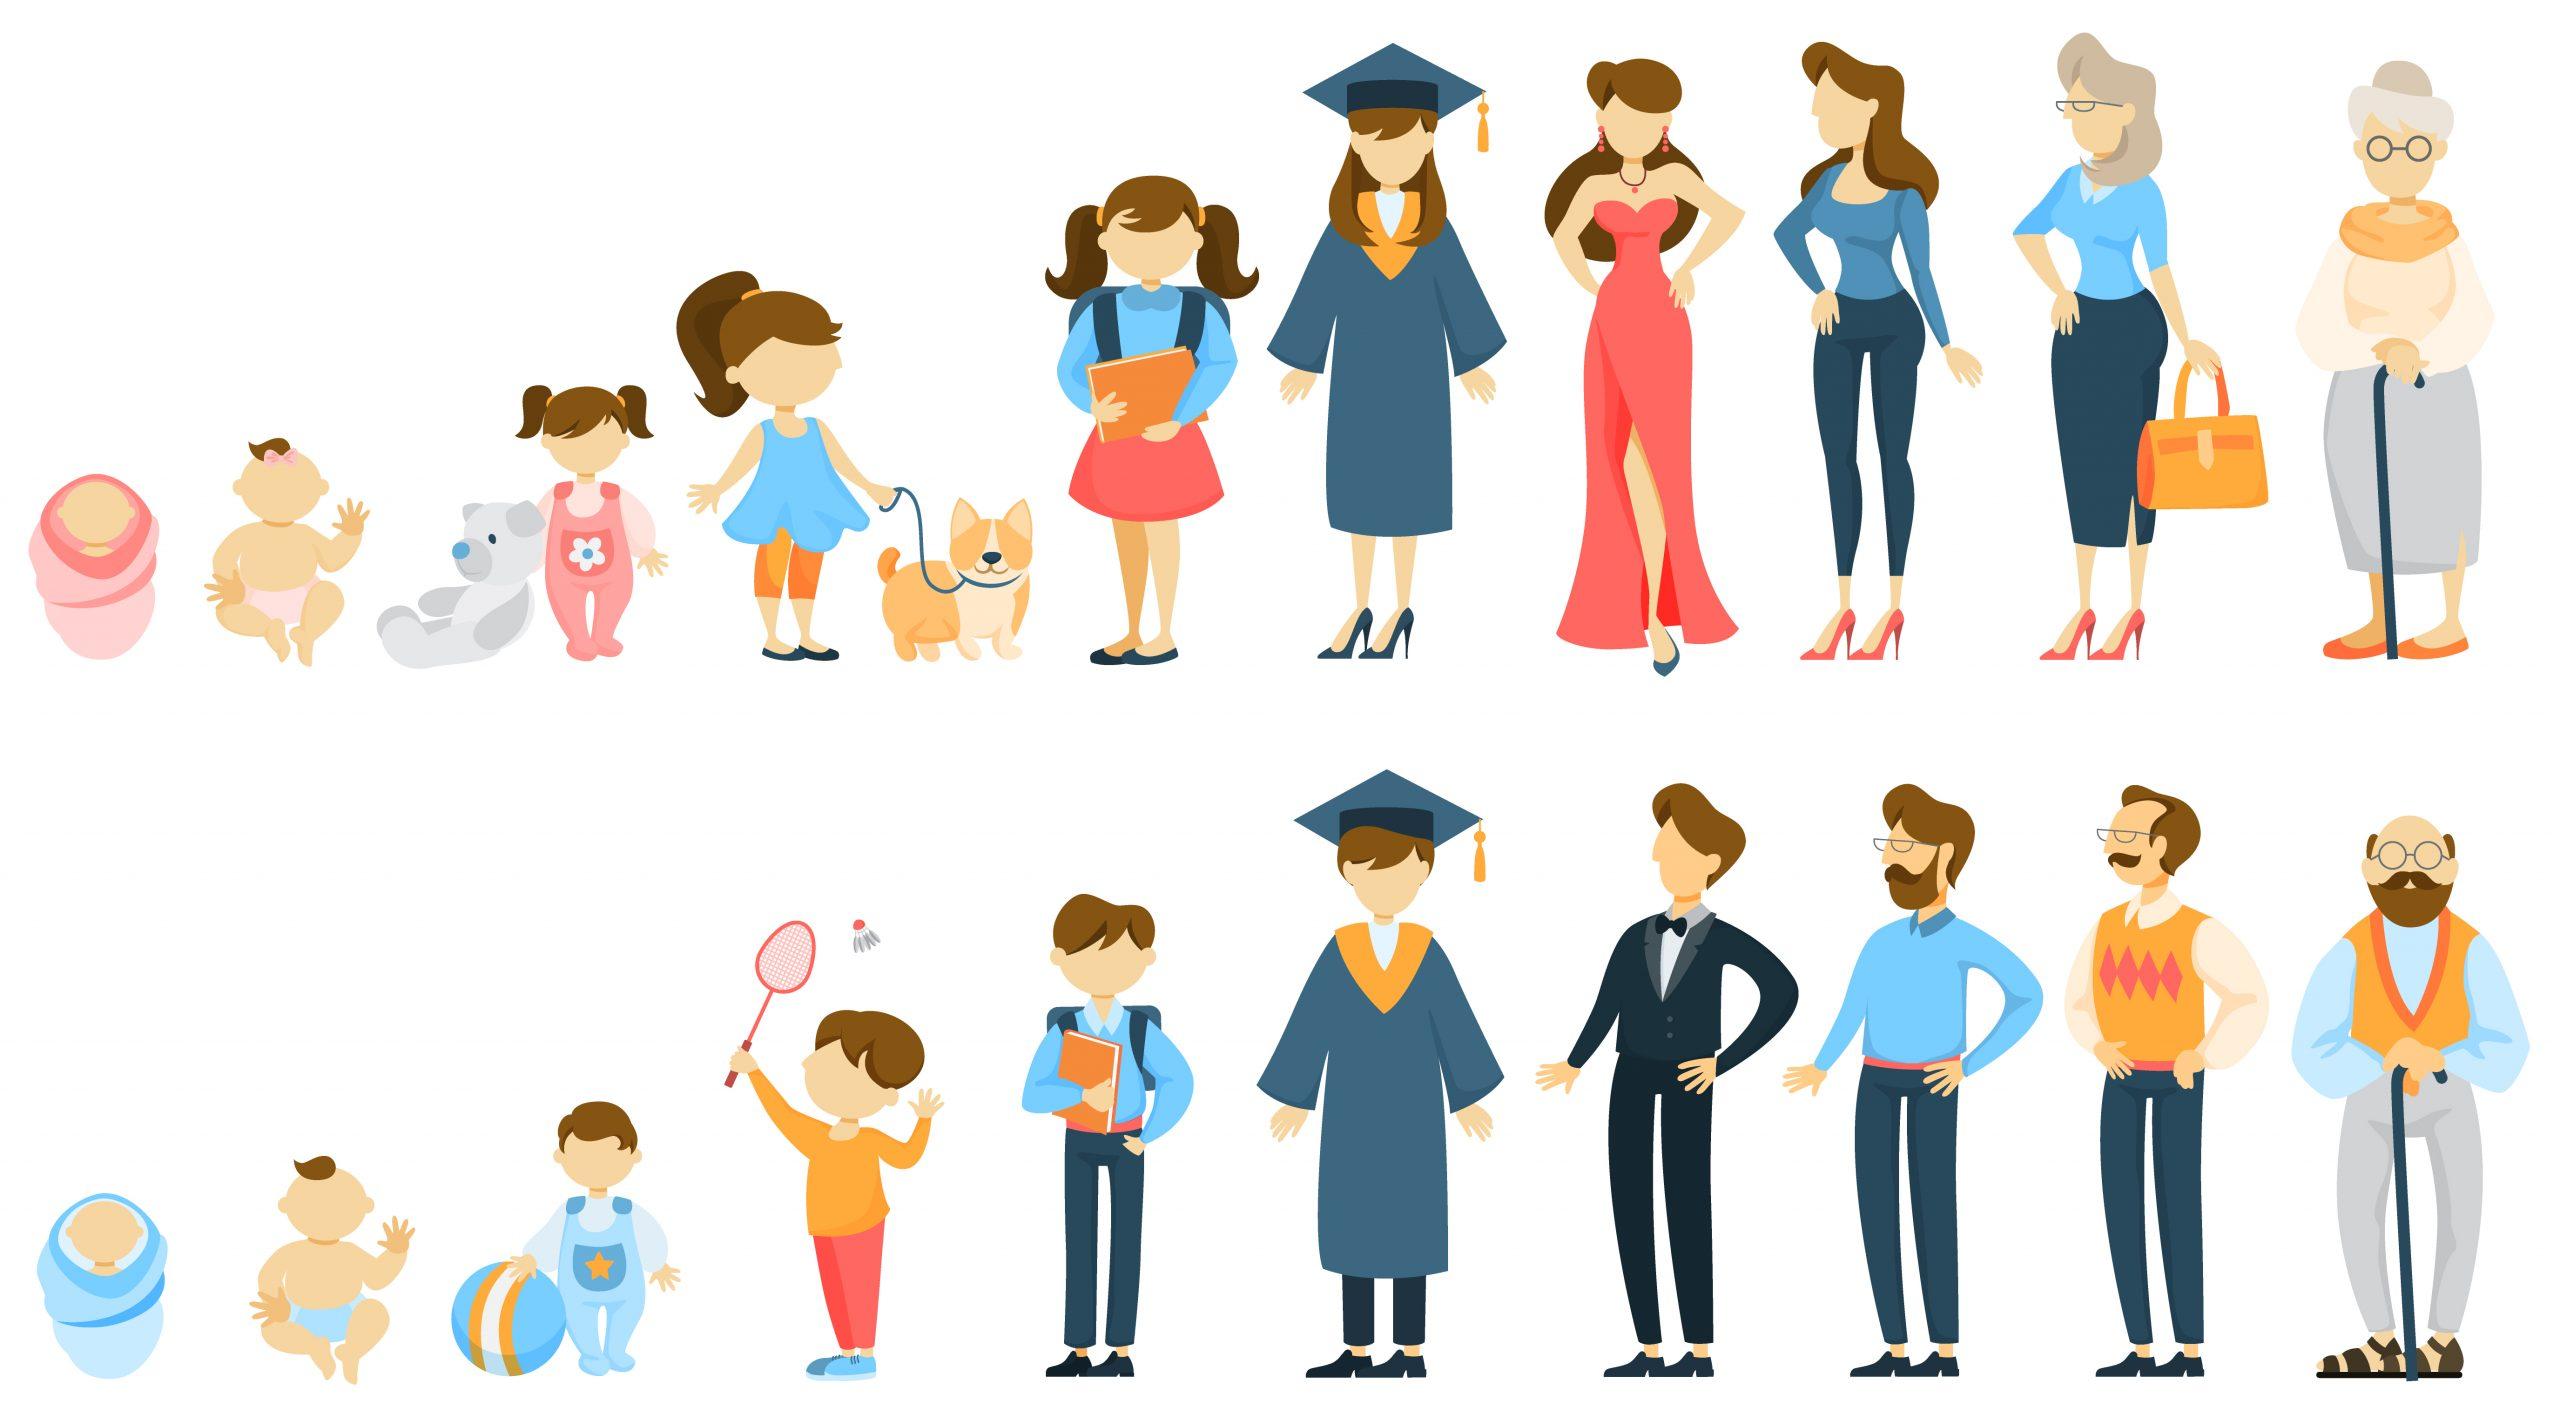 Tutor Explorer - www.tutor-explorer.com - Tutors For Ages - Pre-School - Primary School - Secondary School - College - University - Adult Learning